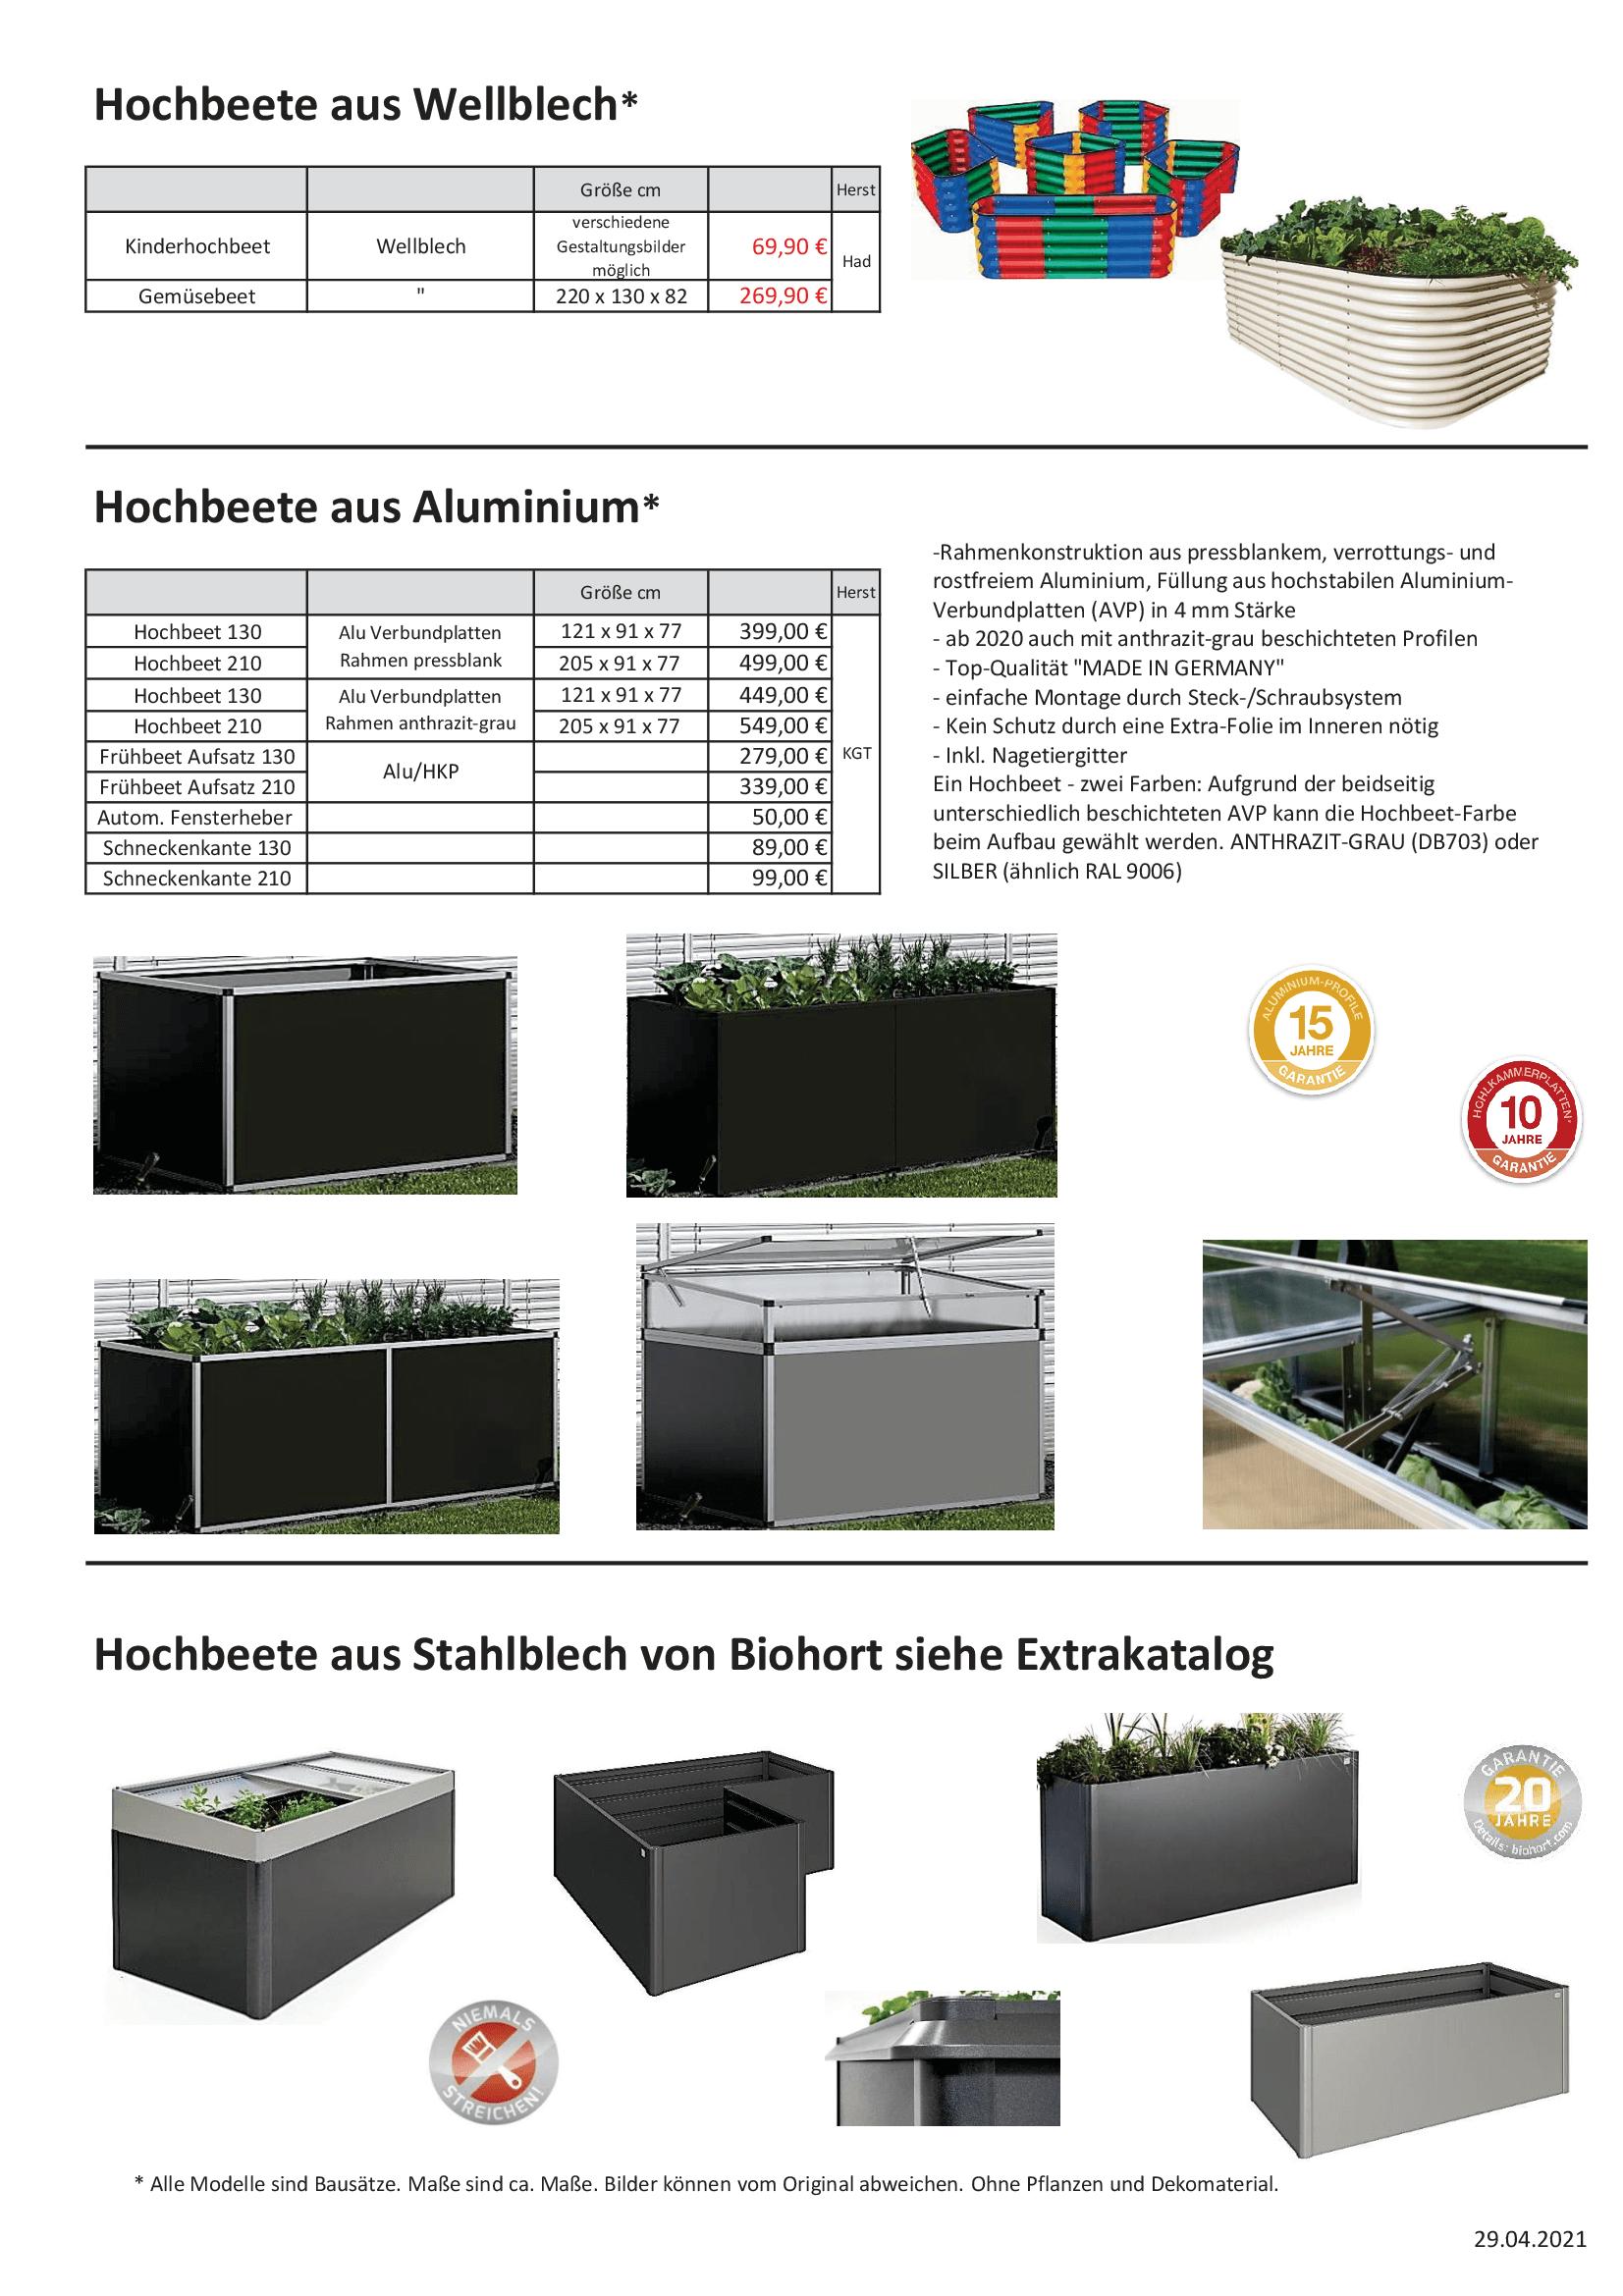 Hochbeete Ueberberg 2021_5